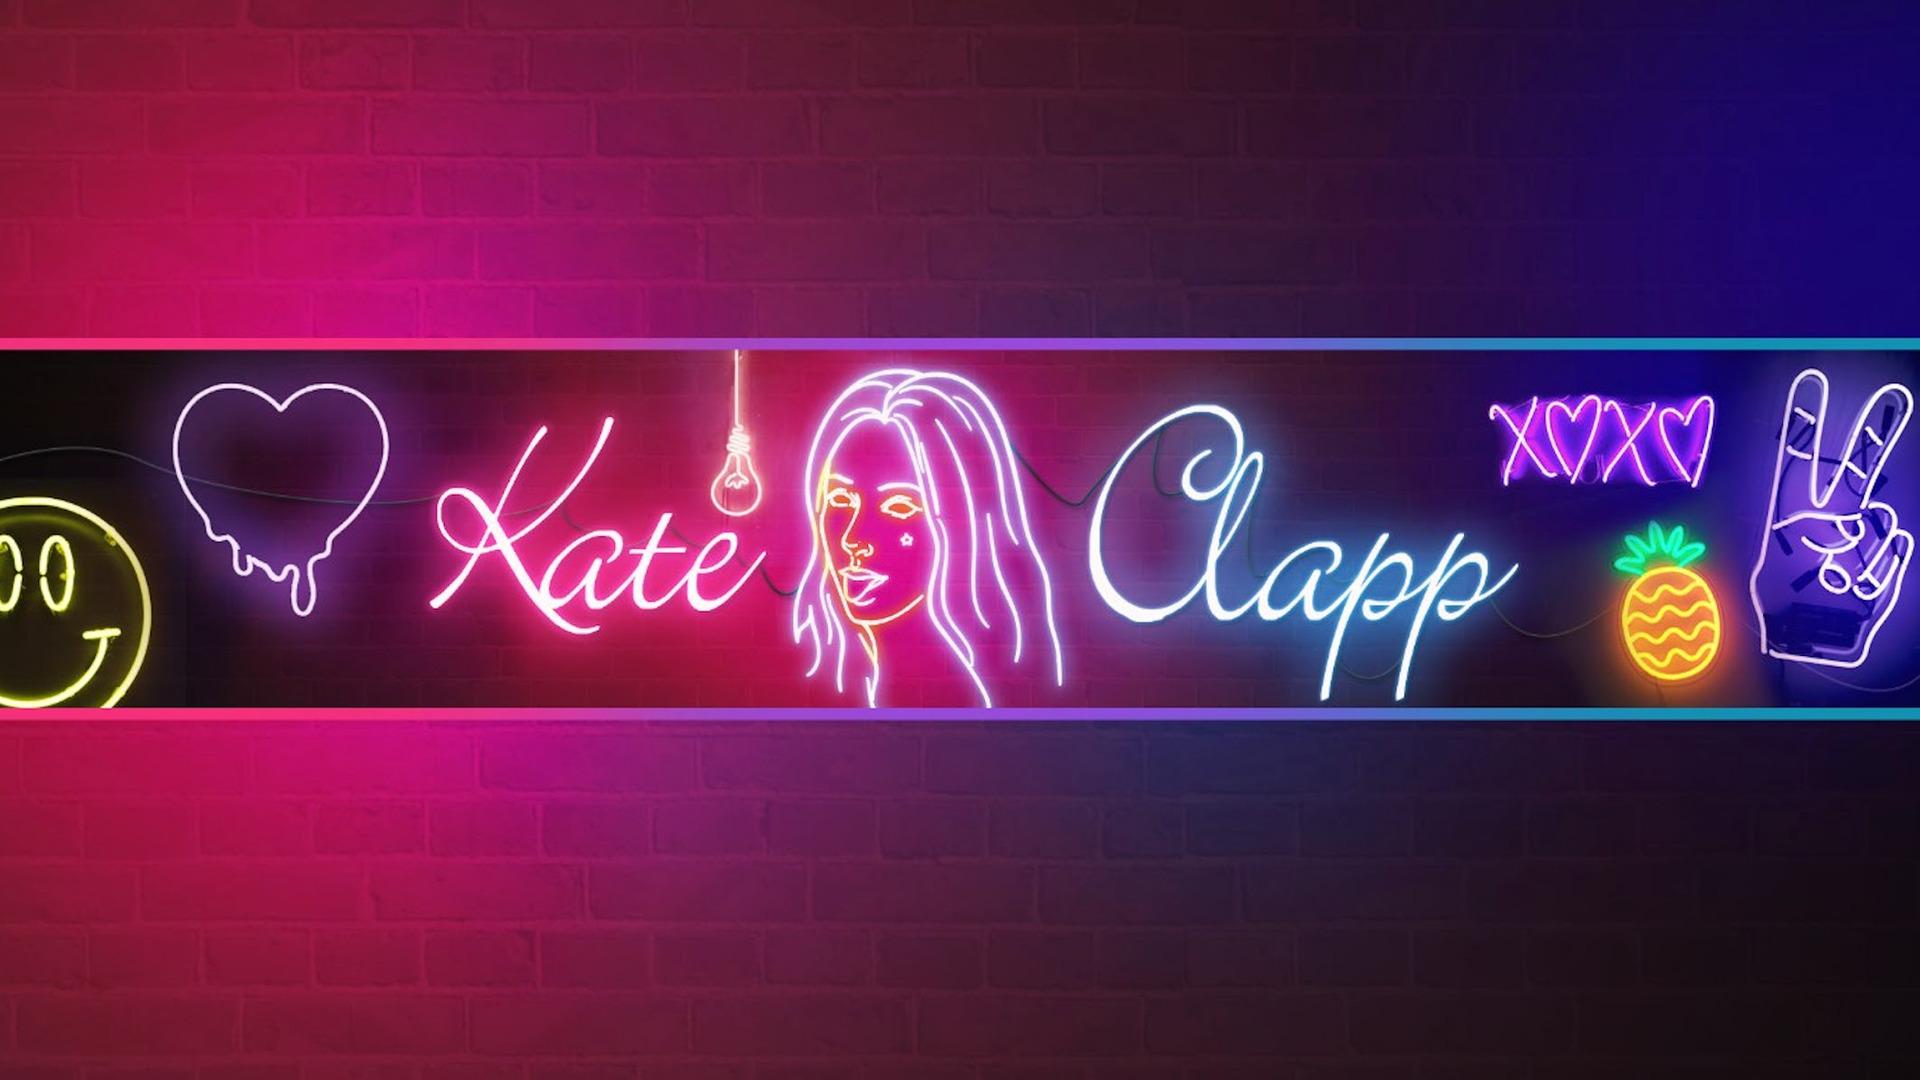 Show TheKateClapp